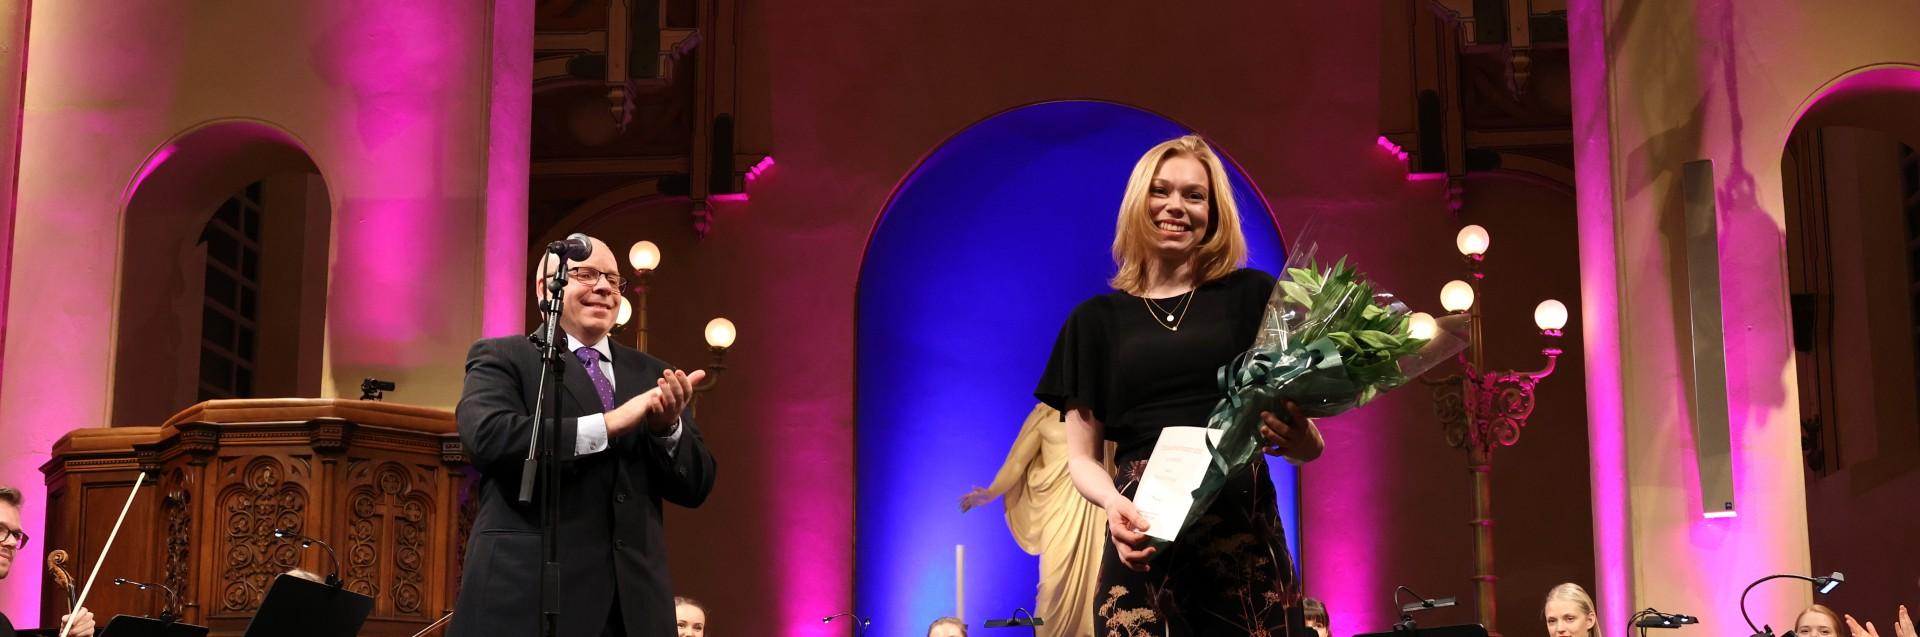 Thea Kjeseth Dolmen vant Steenslandstipendet 2020 på 50 000 kroner. Foto: UiS/Mari Hult